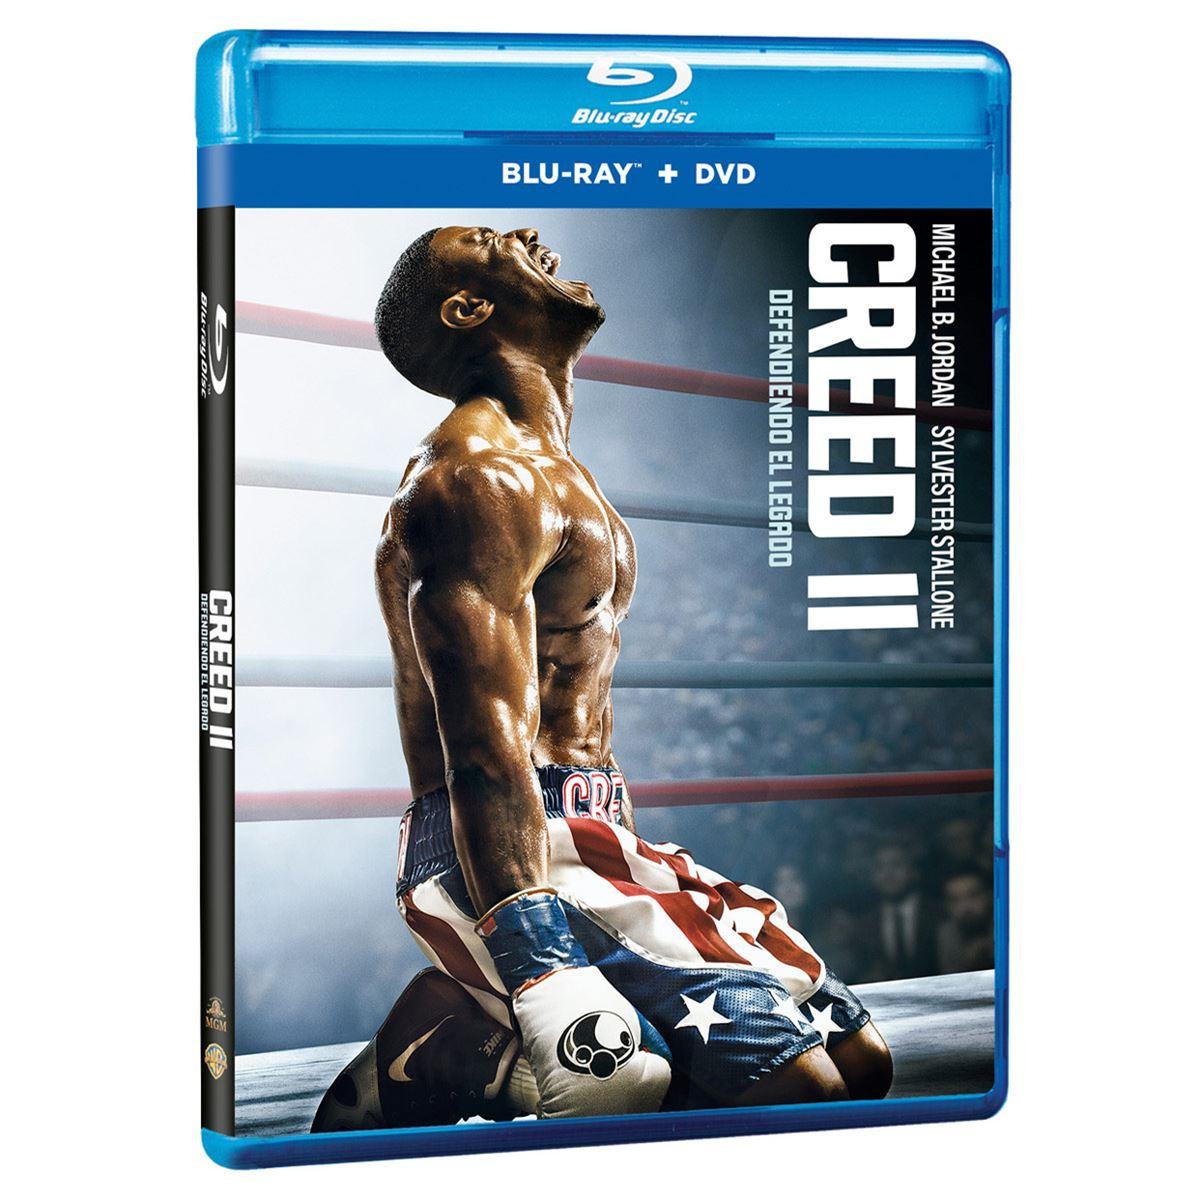 BR/DVD Creed II Combo